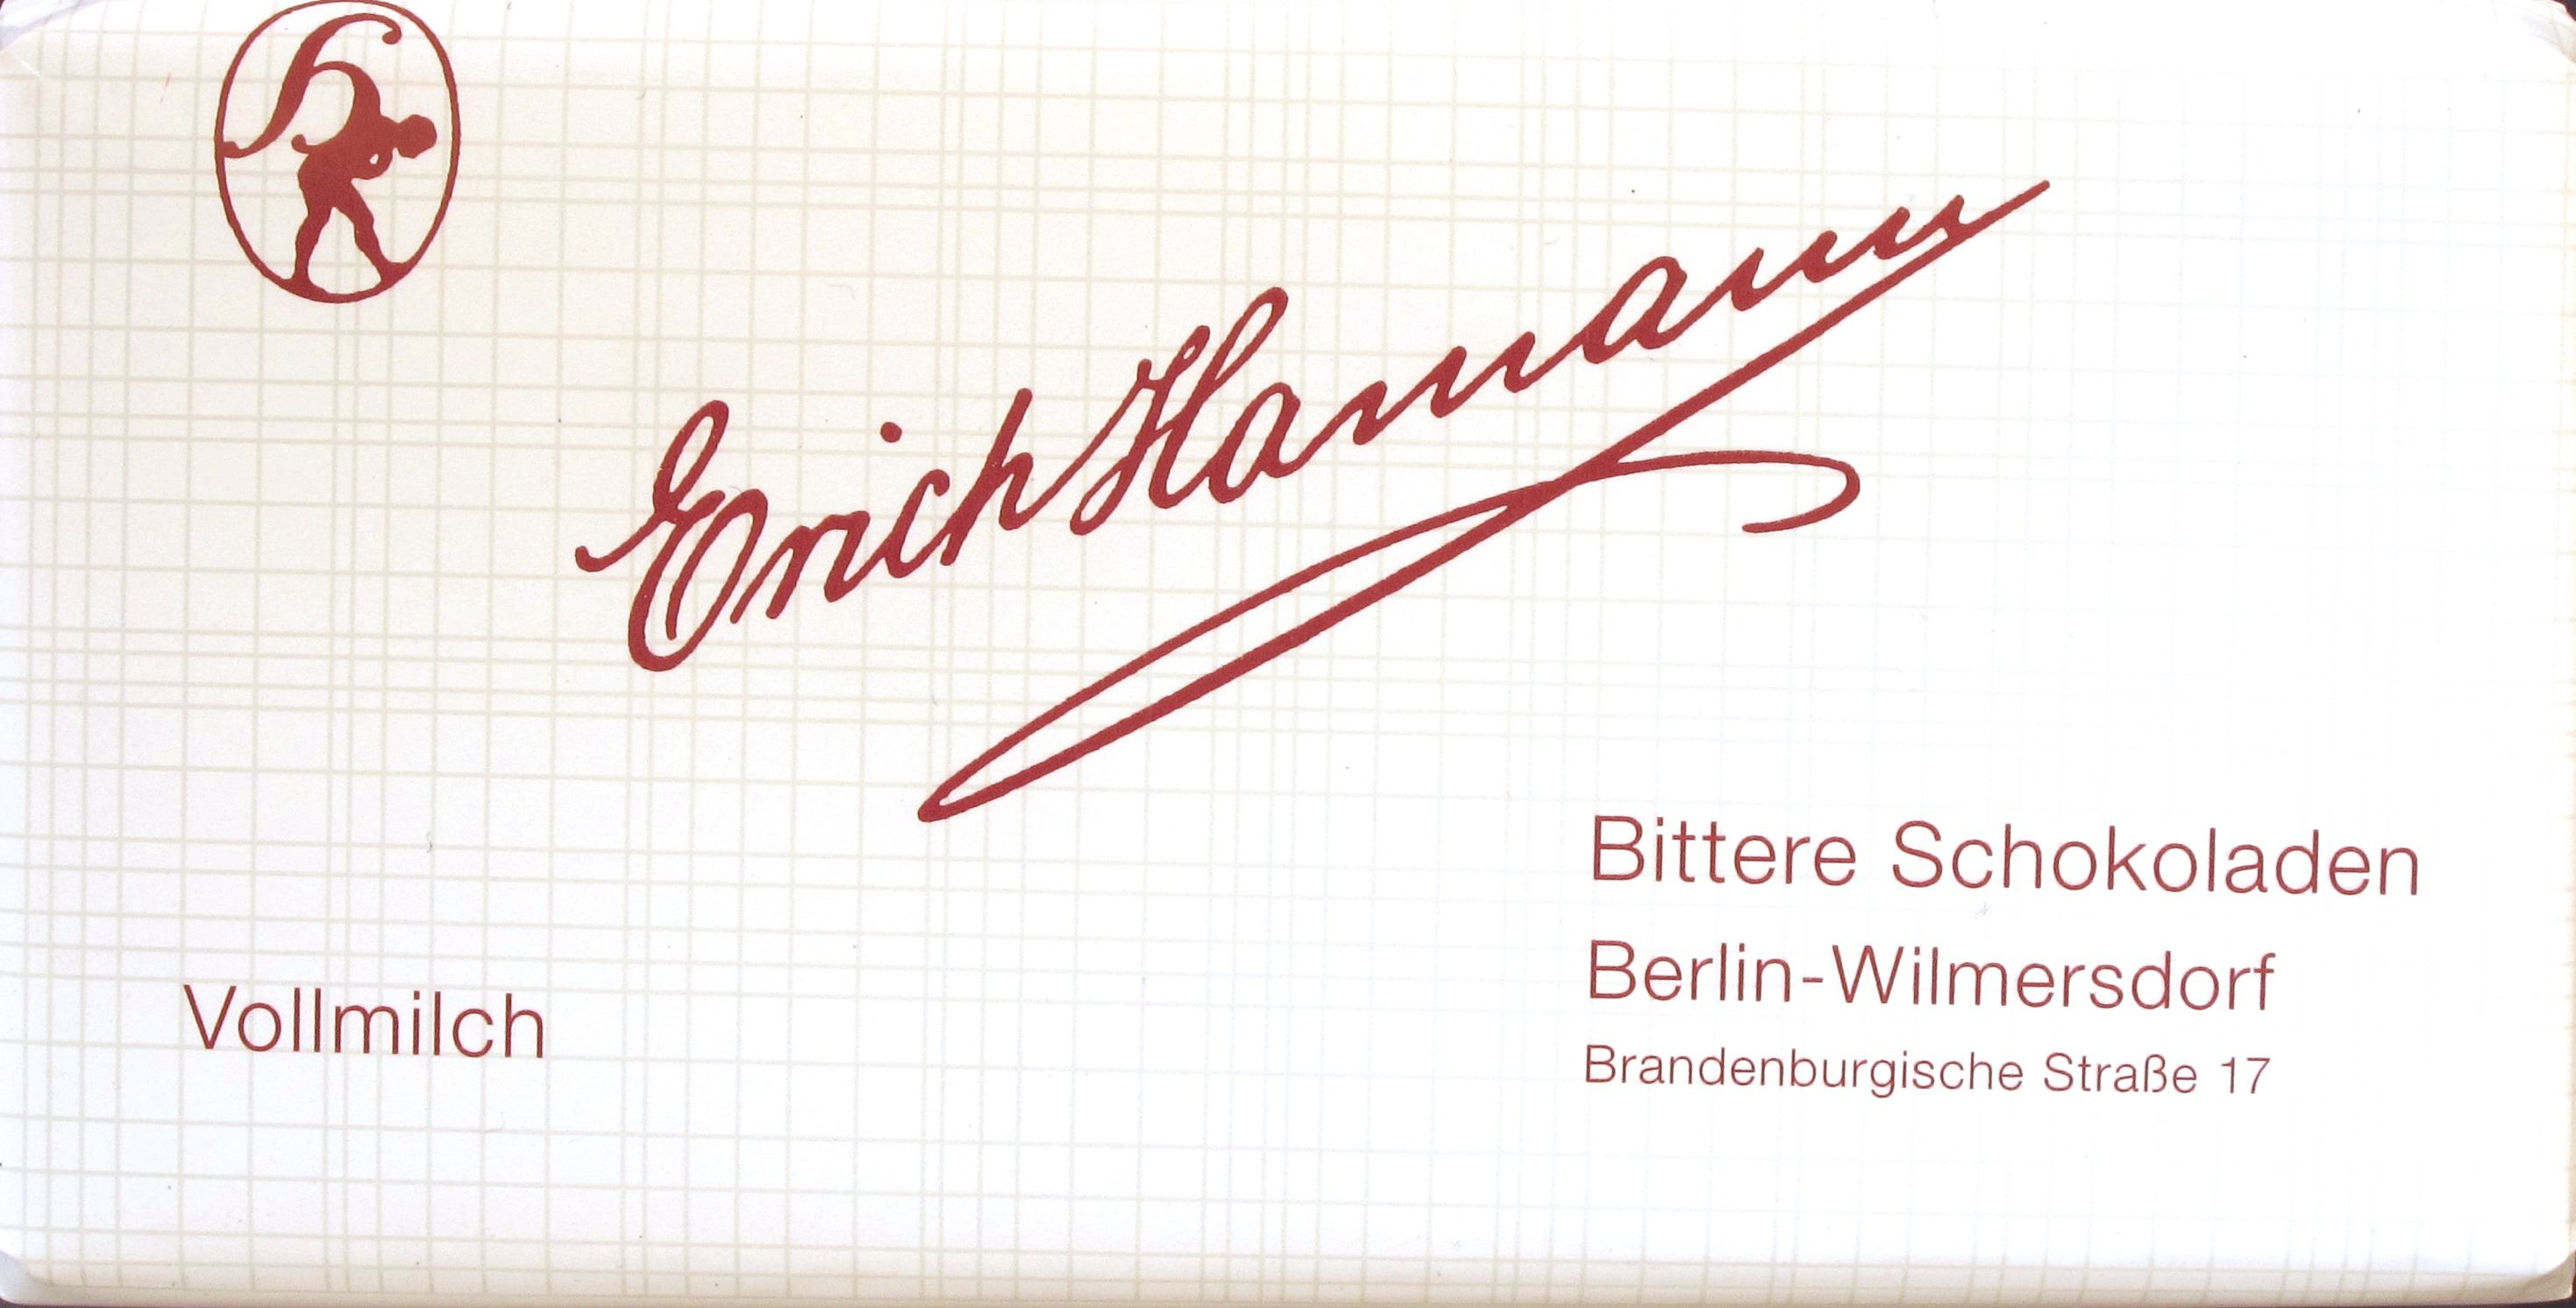 Packung, Erich Hamann, 40%-Schokolade